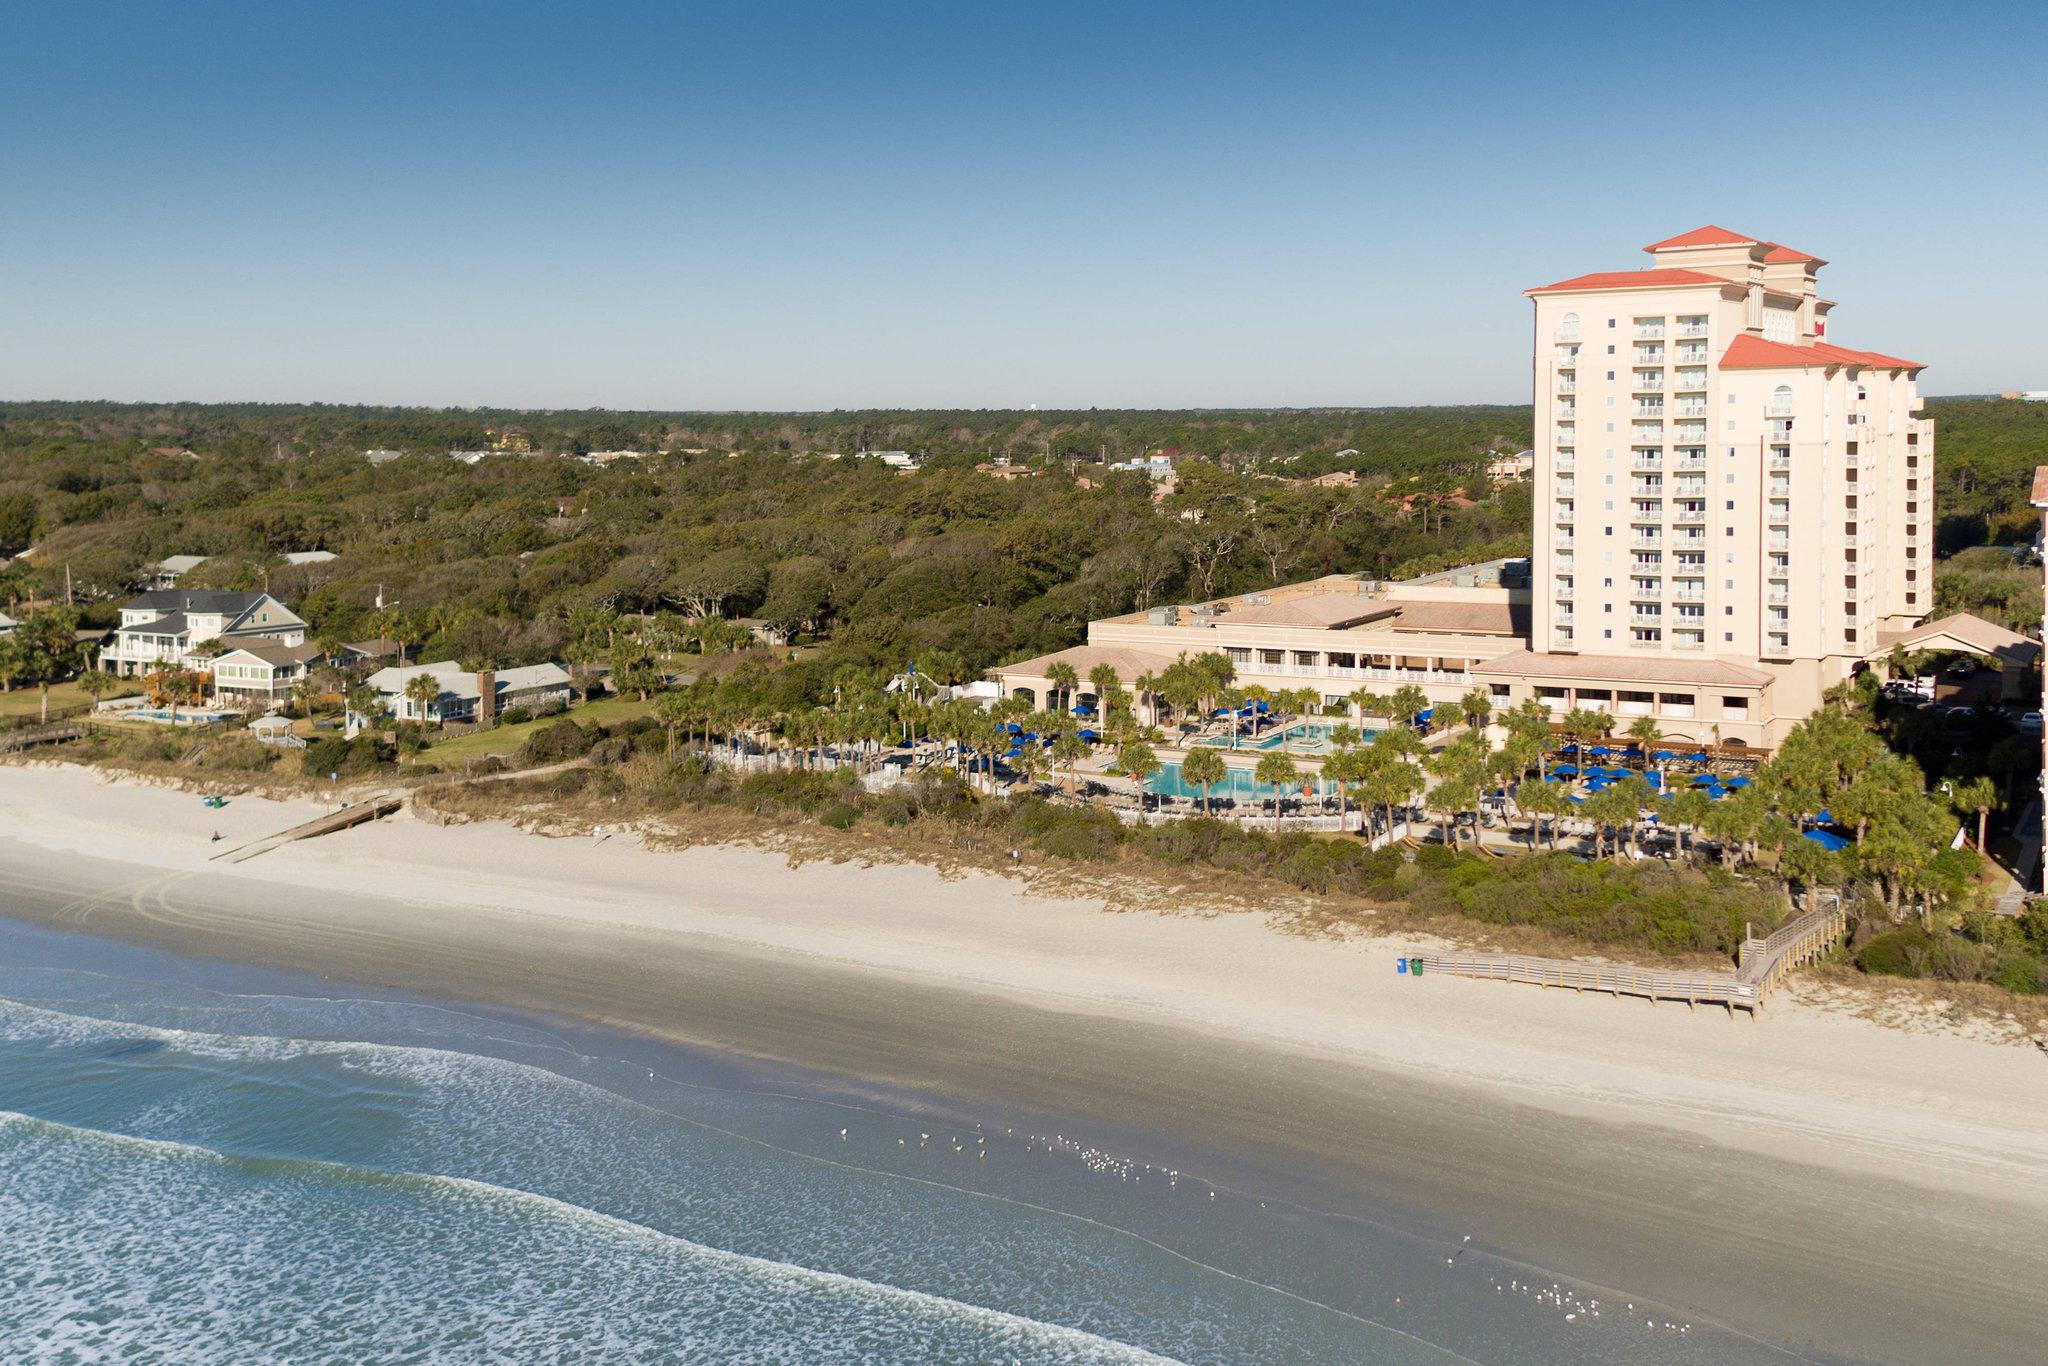 Marriott Myrtle Beach Resort & Spa at Grande Dunes